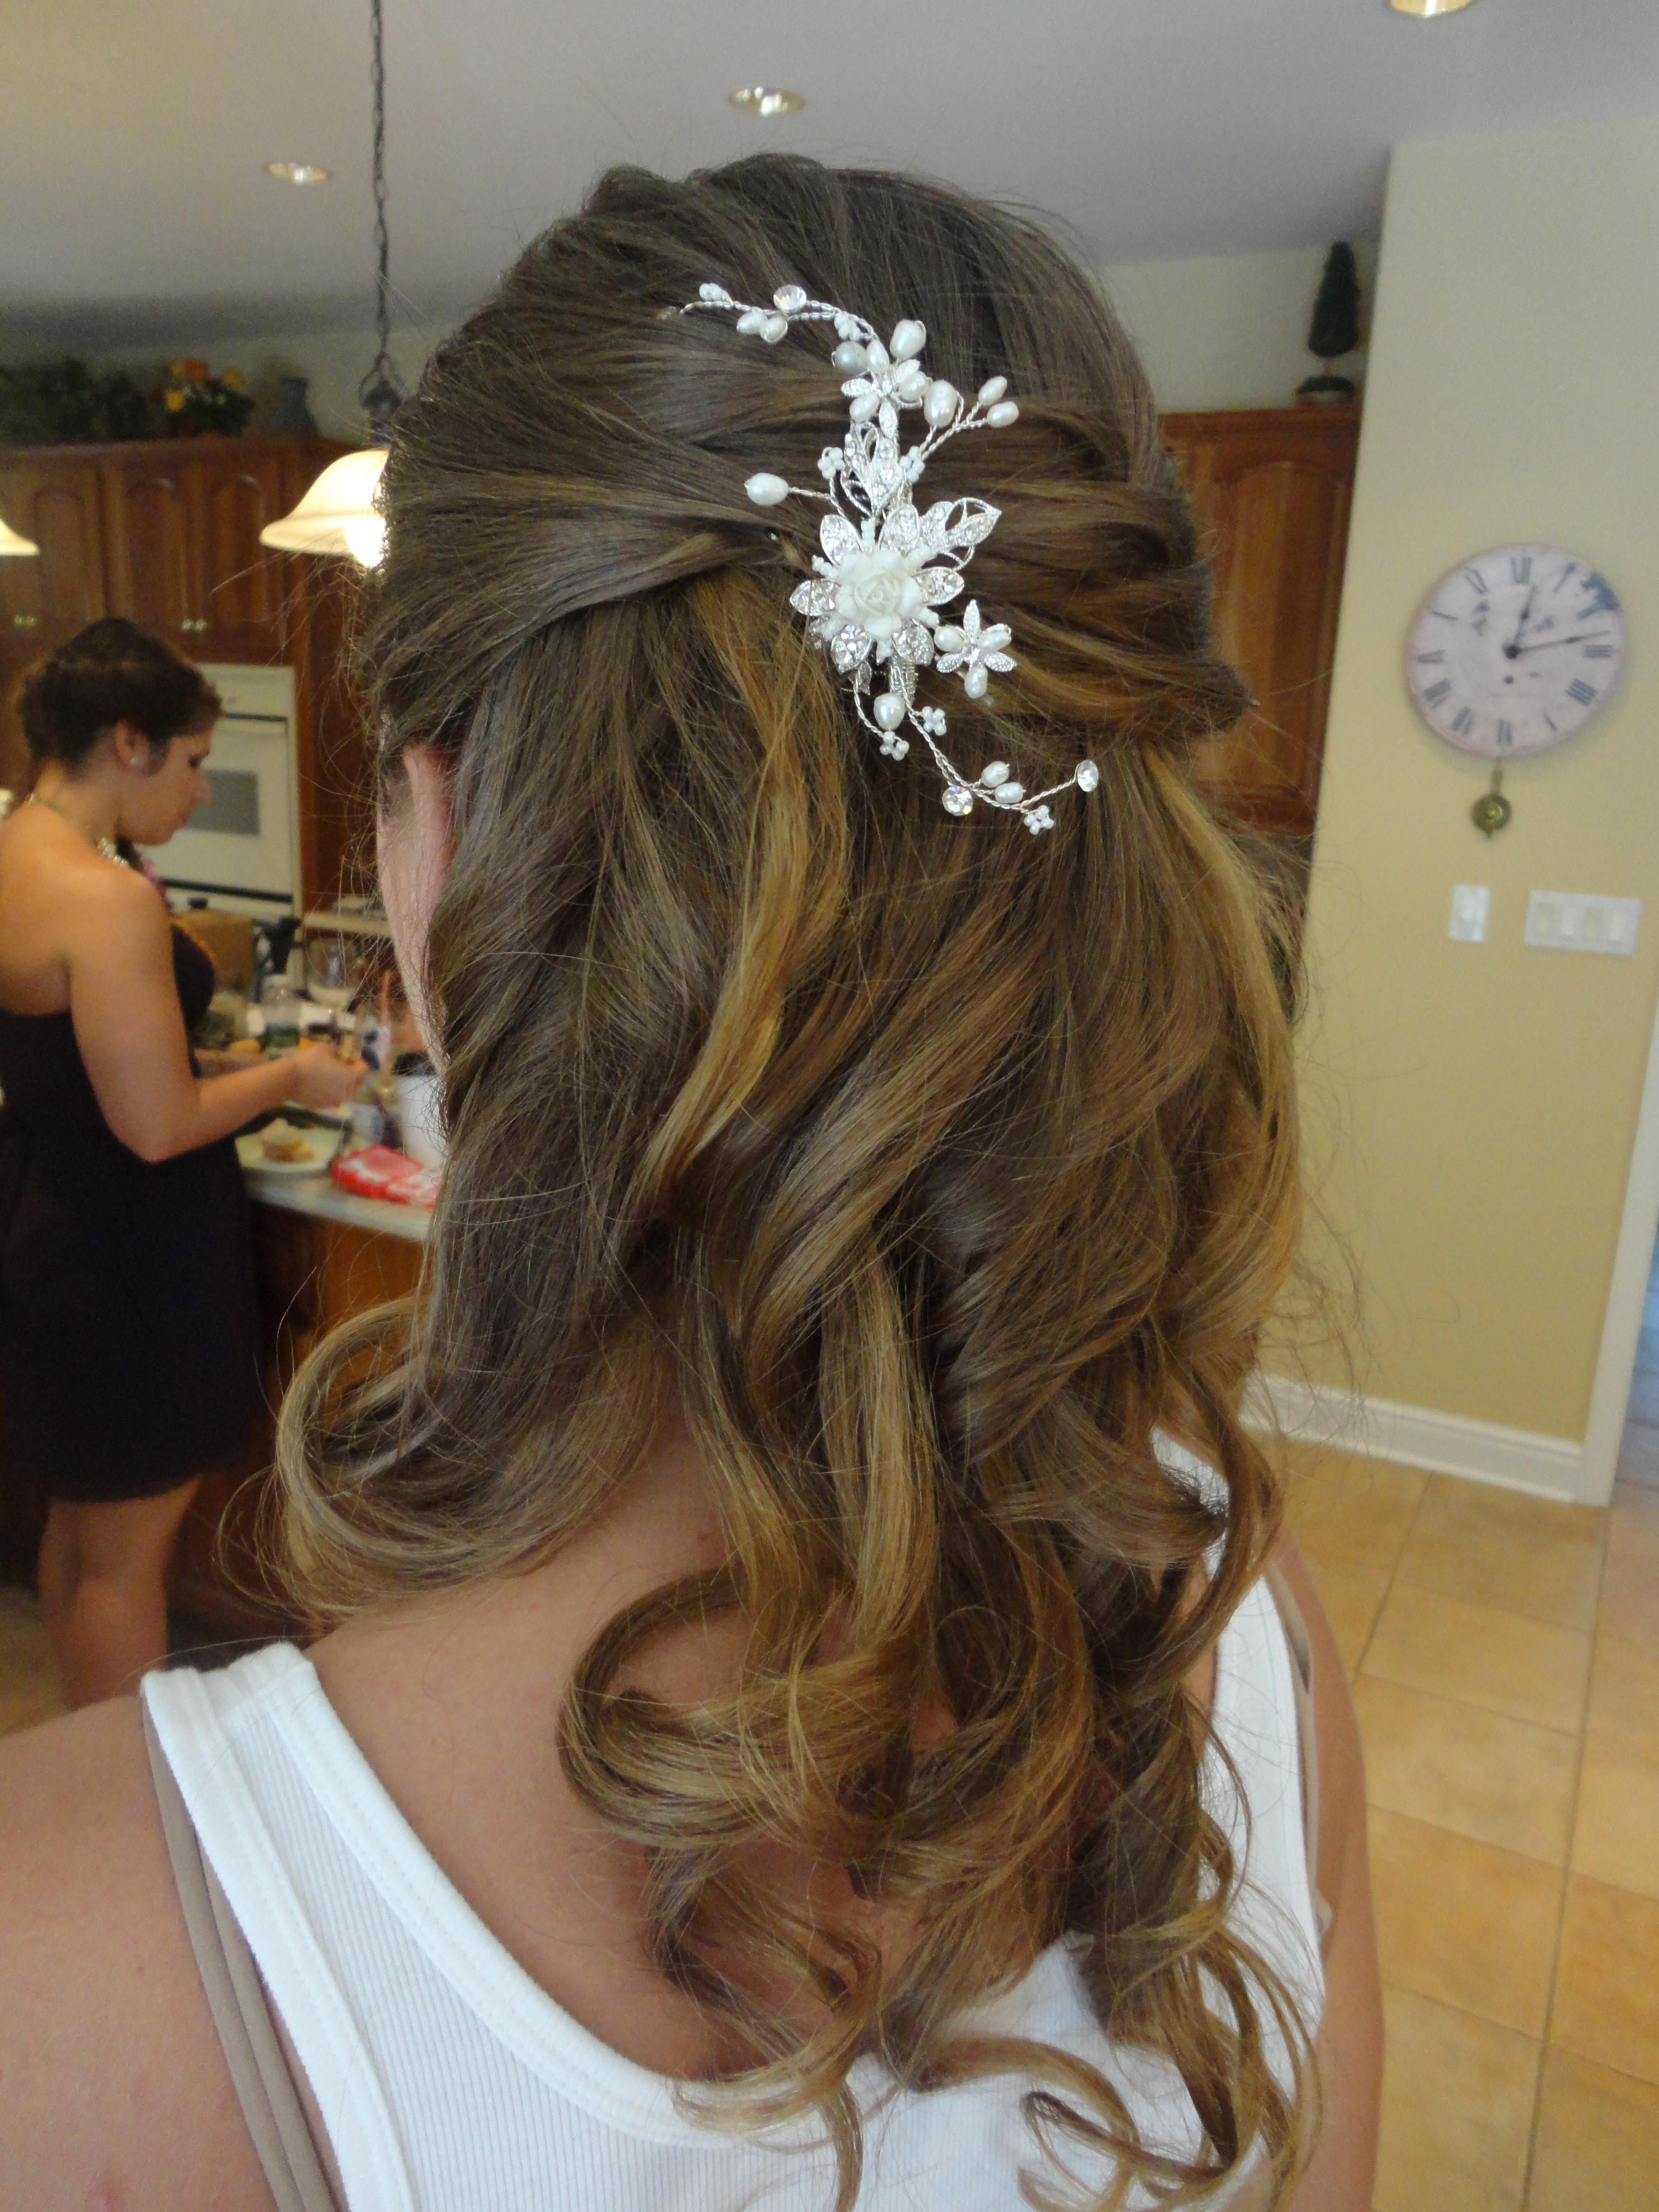 Half Up Half Down Wedding Hairstyles With Headband Wedding hair design ...